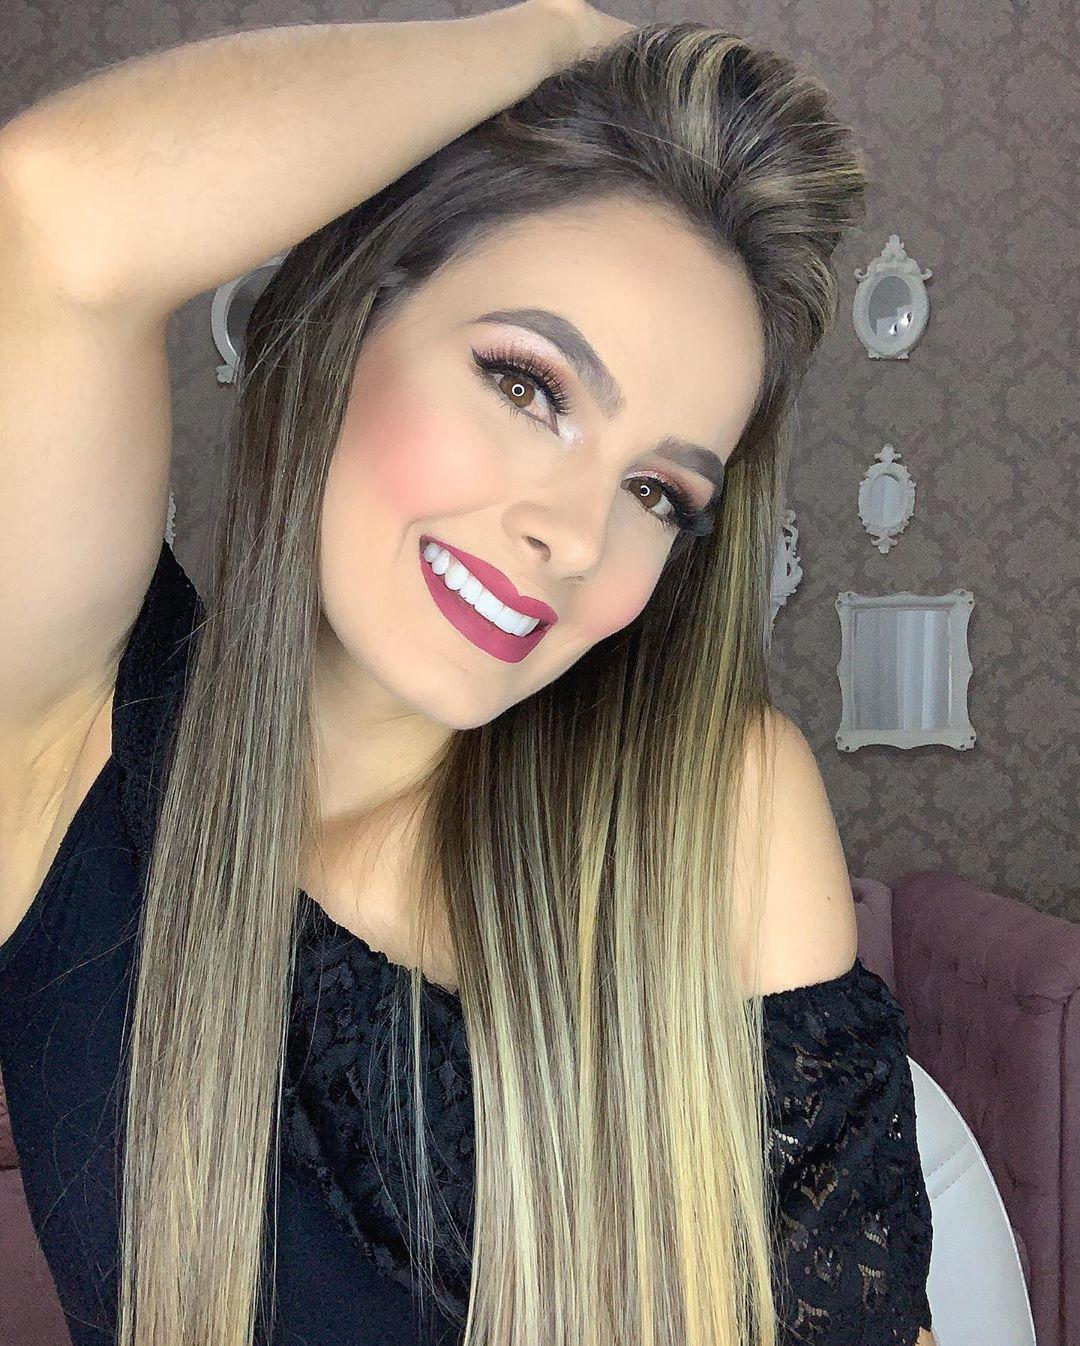 Ana-Jessica-Wallpapers-Insta-Fit-Bio-5